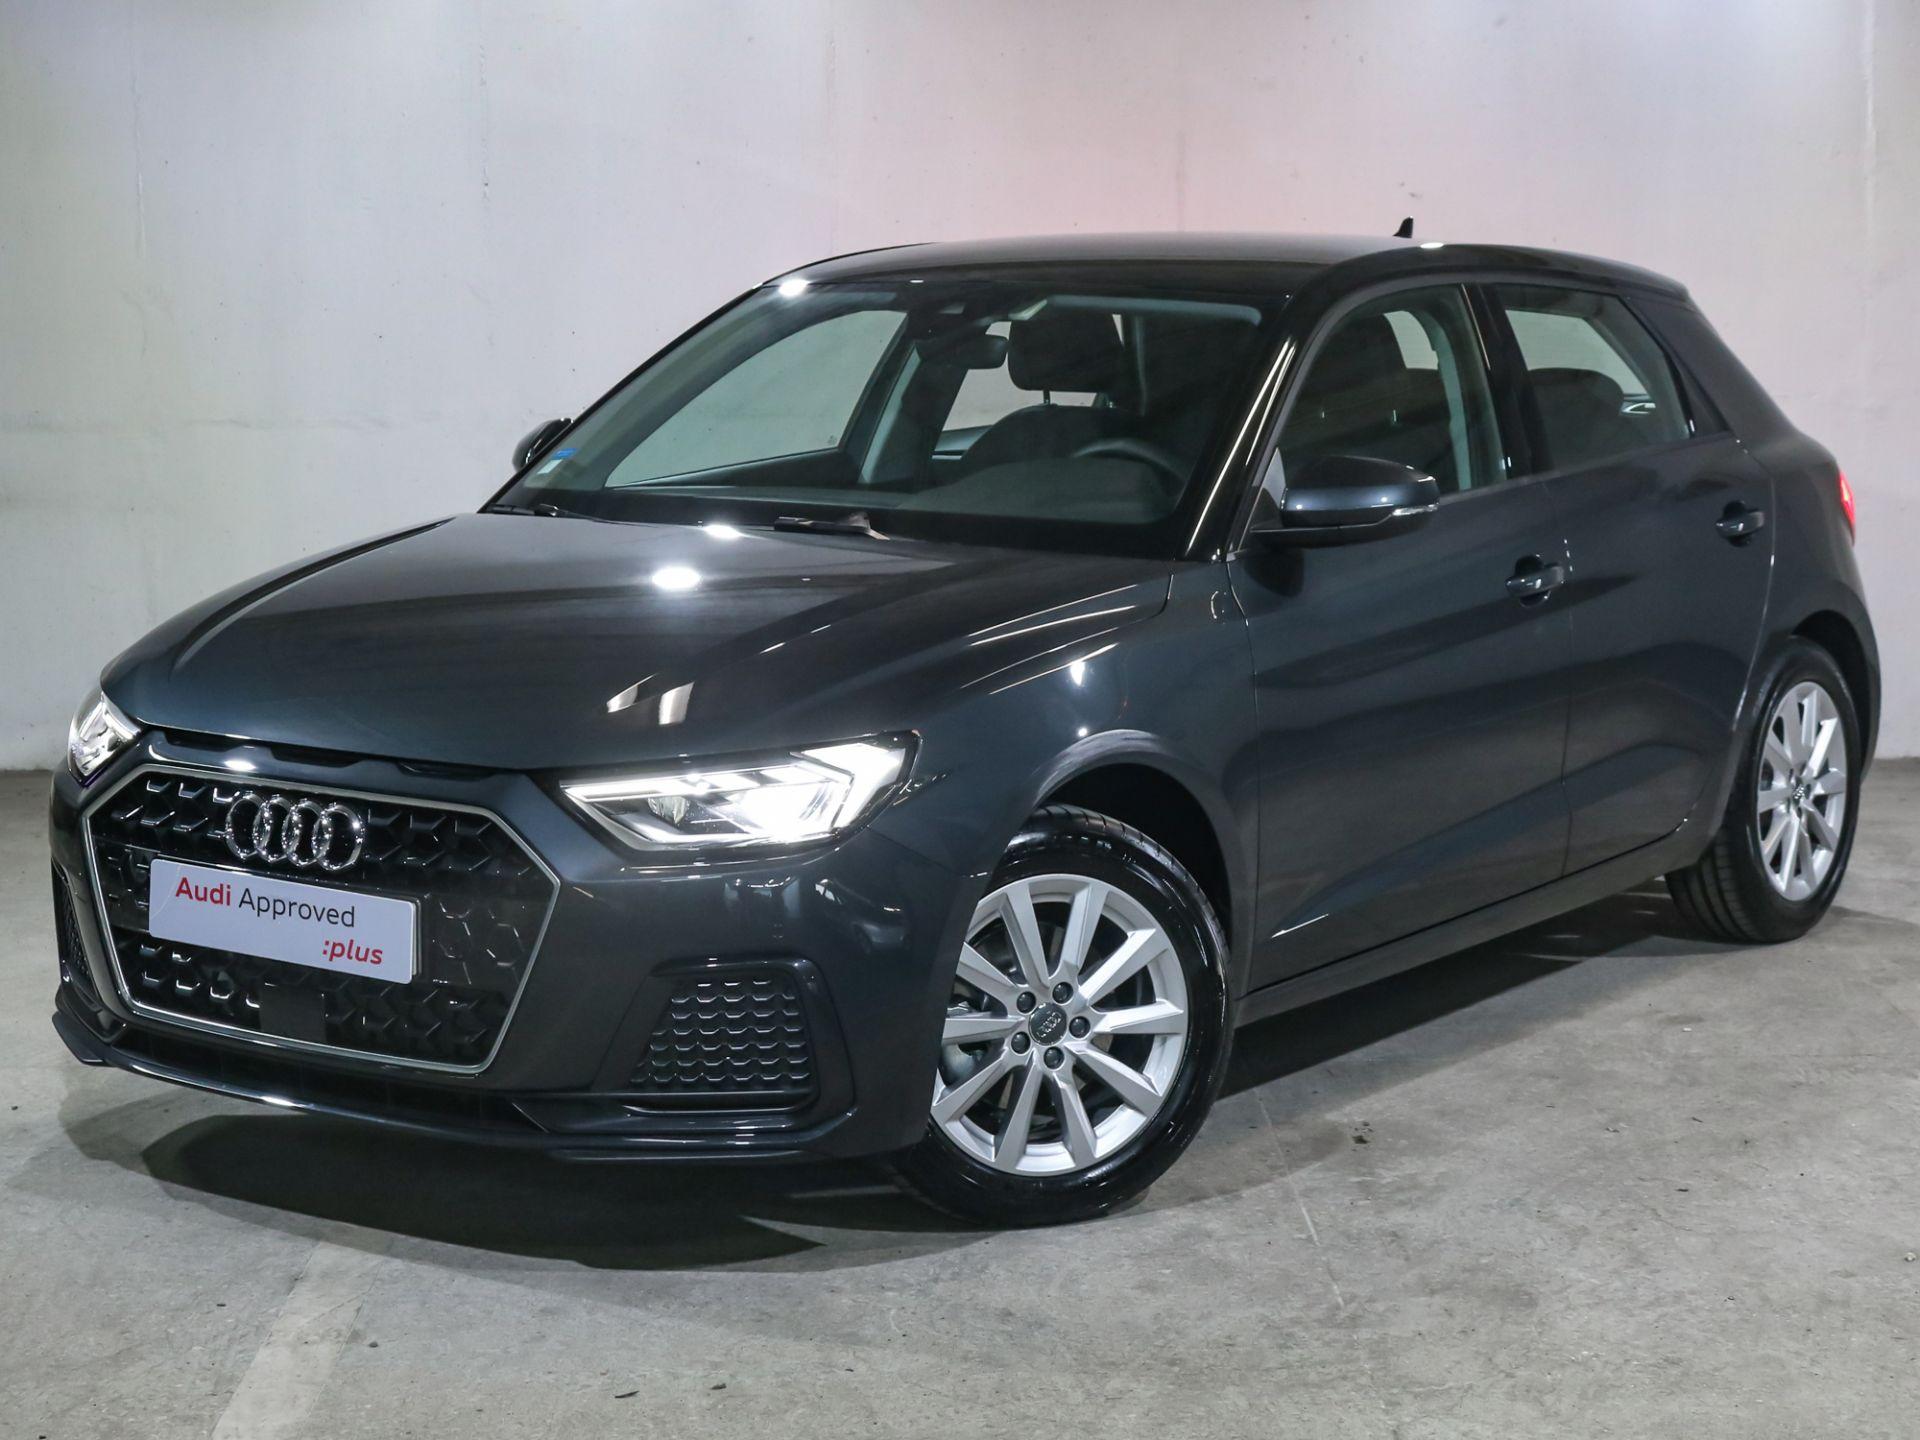 Audi A1 30 TFSI Advanced Sportback segunda mão Lisboa